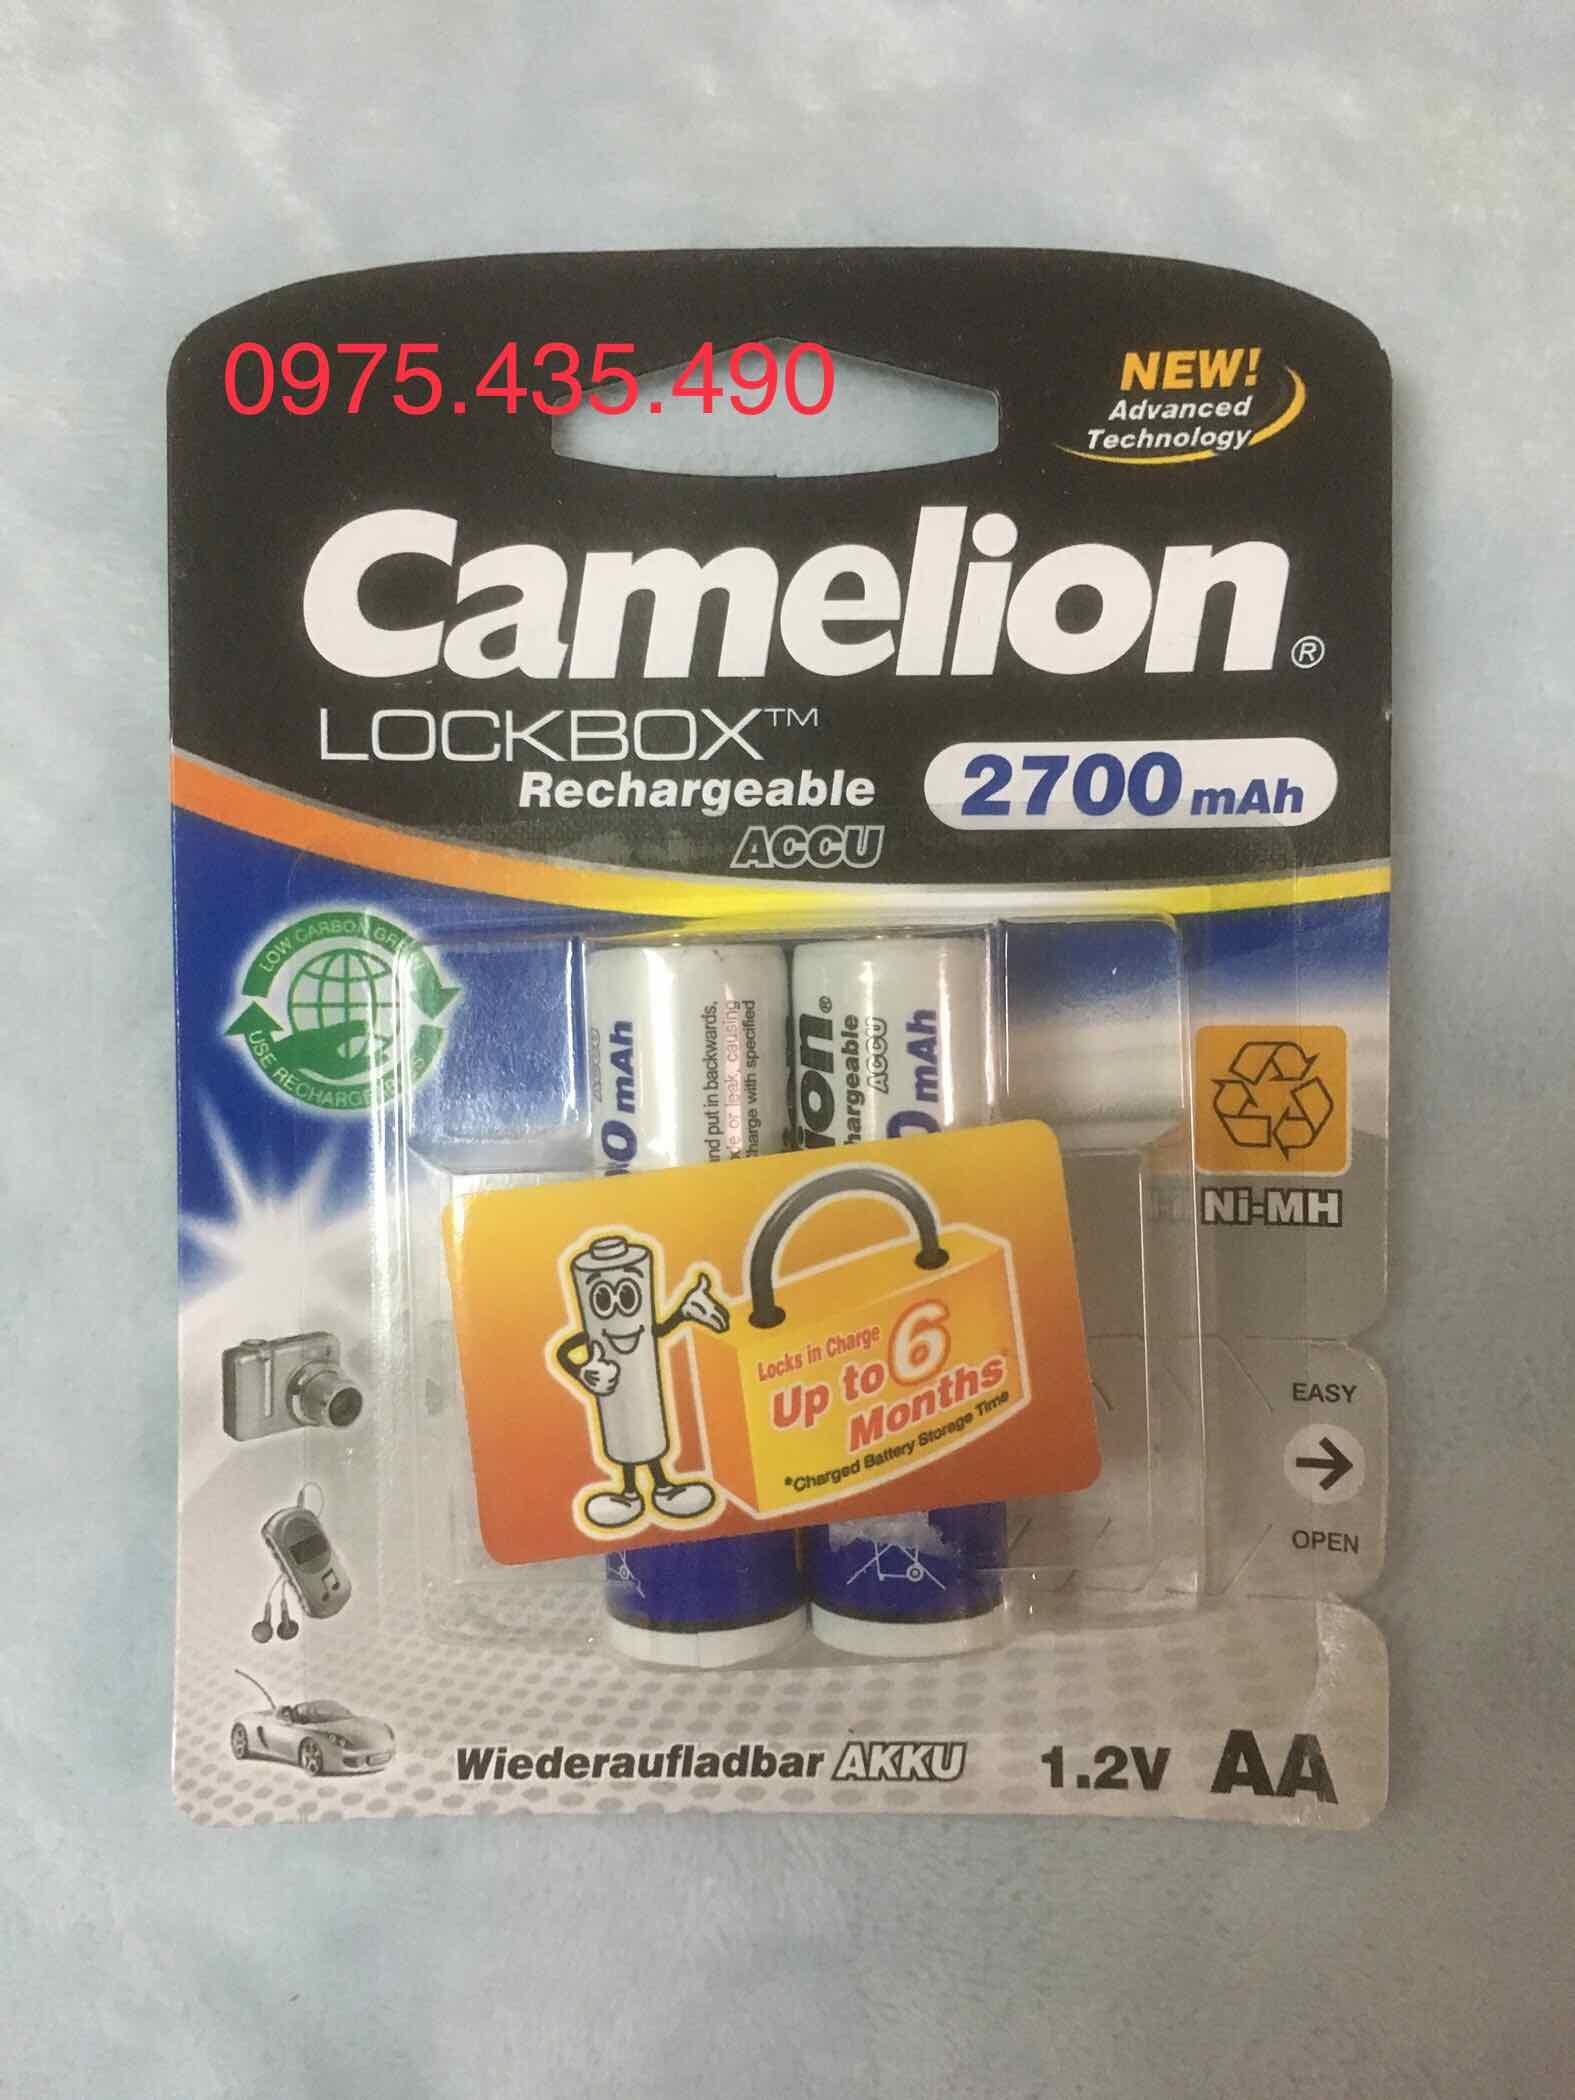 Pin Sạc AA Camelion 2700 mAh NH-AA2700LP2 LockBox Rechageable Vỉ 2 Viên